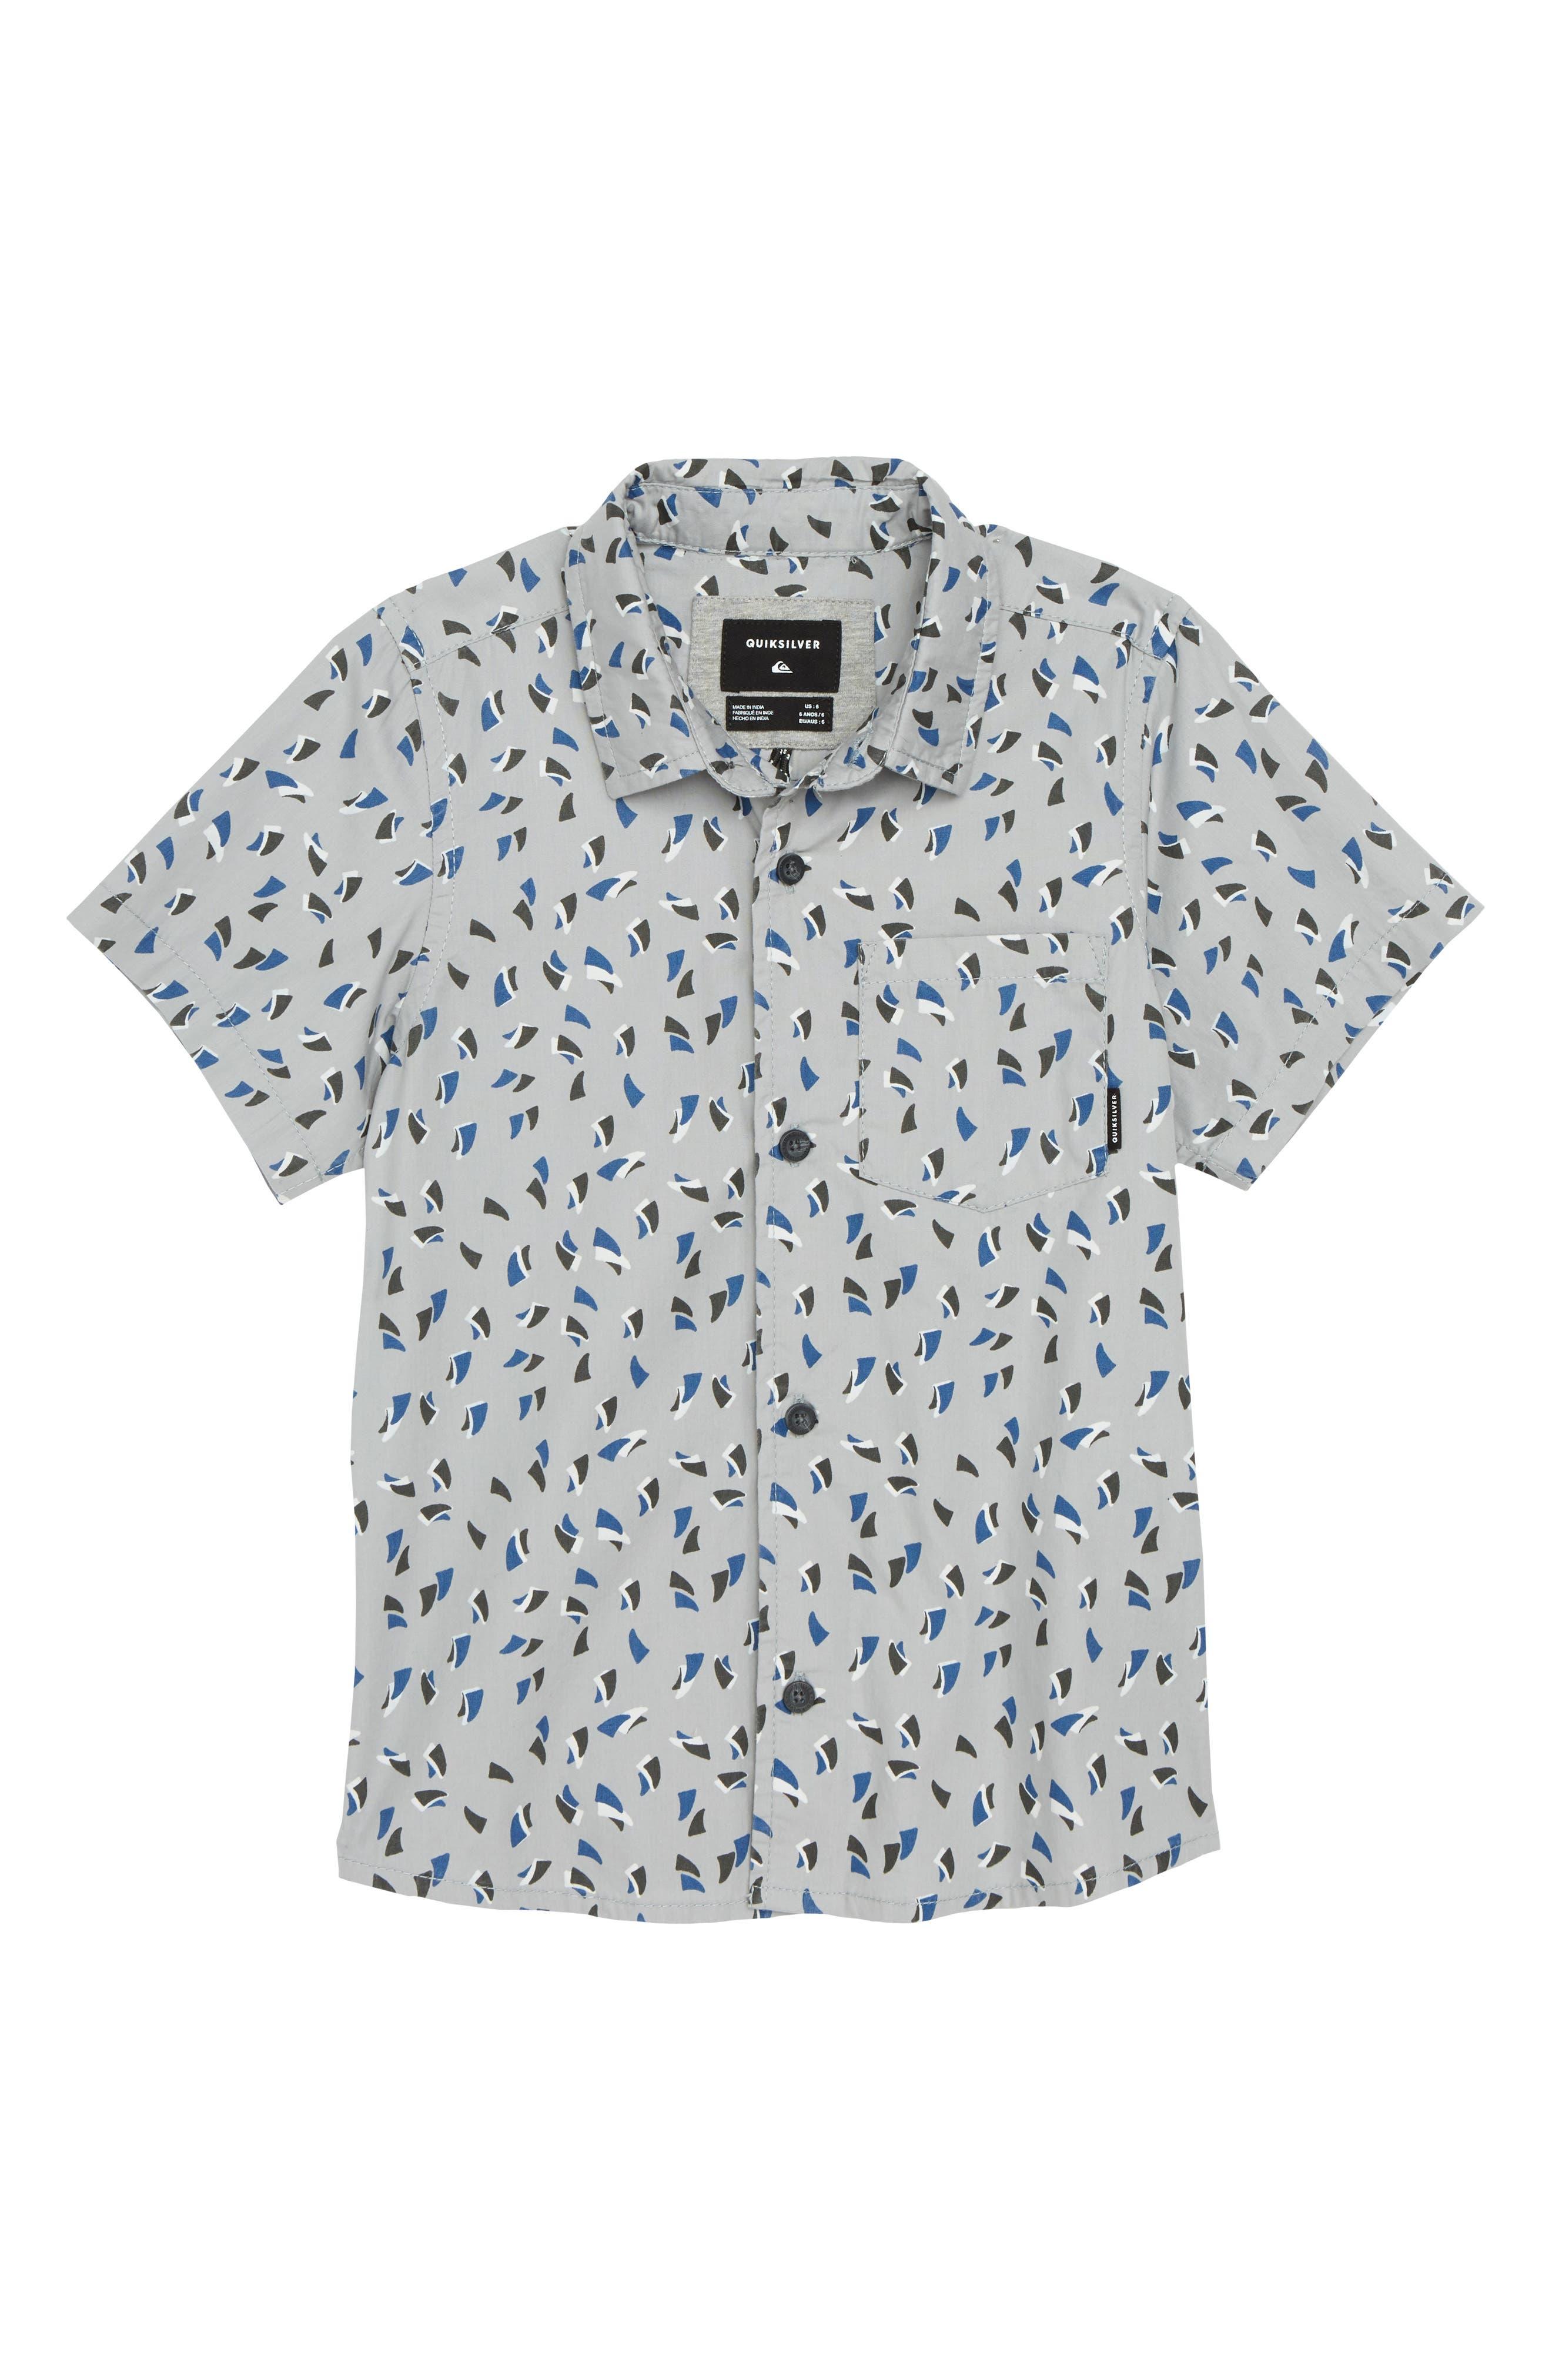 Akan Waters Woven Shirt,                         Main,                         color, SLEET MECHANICAL